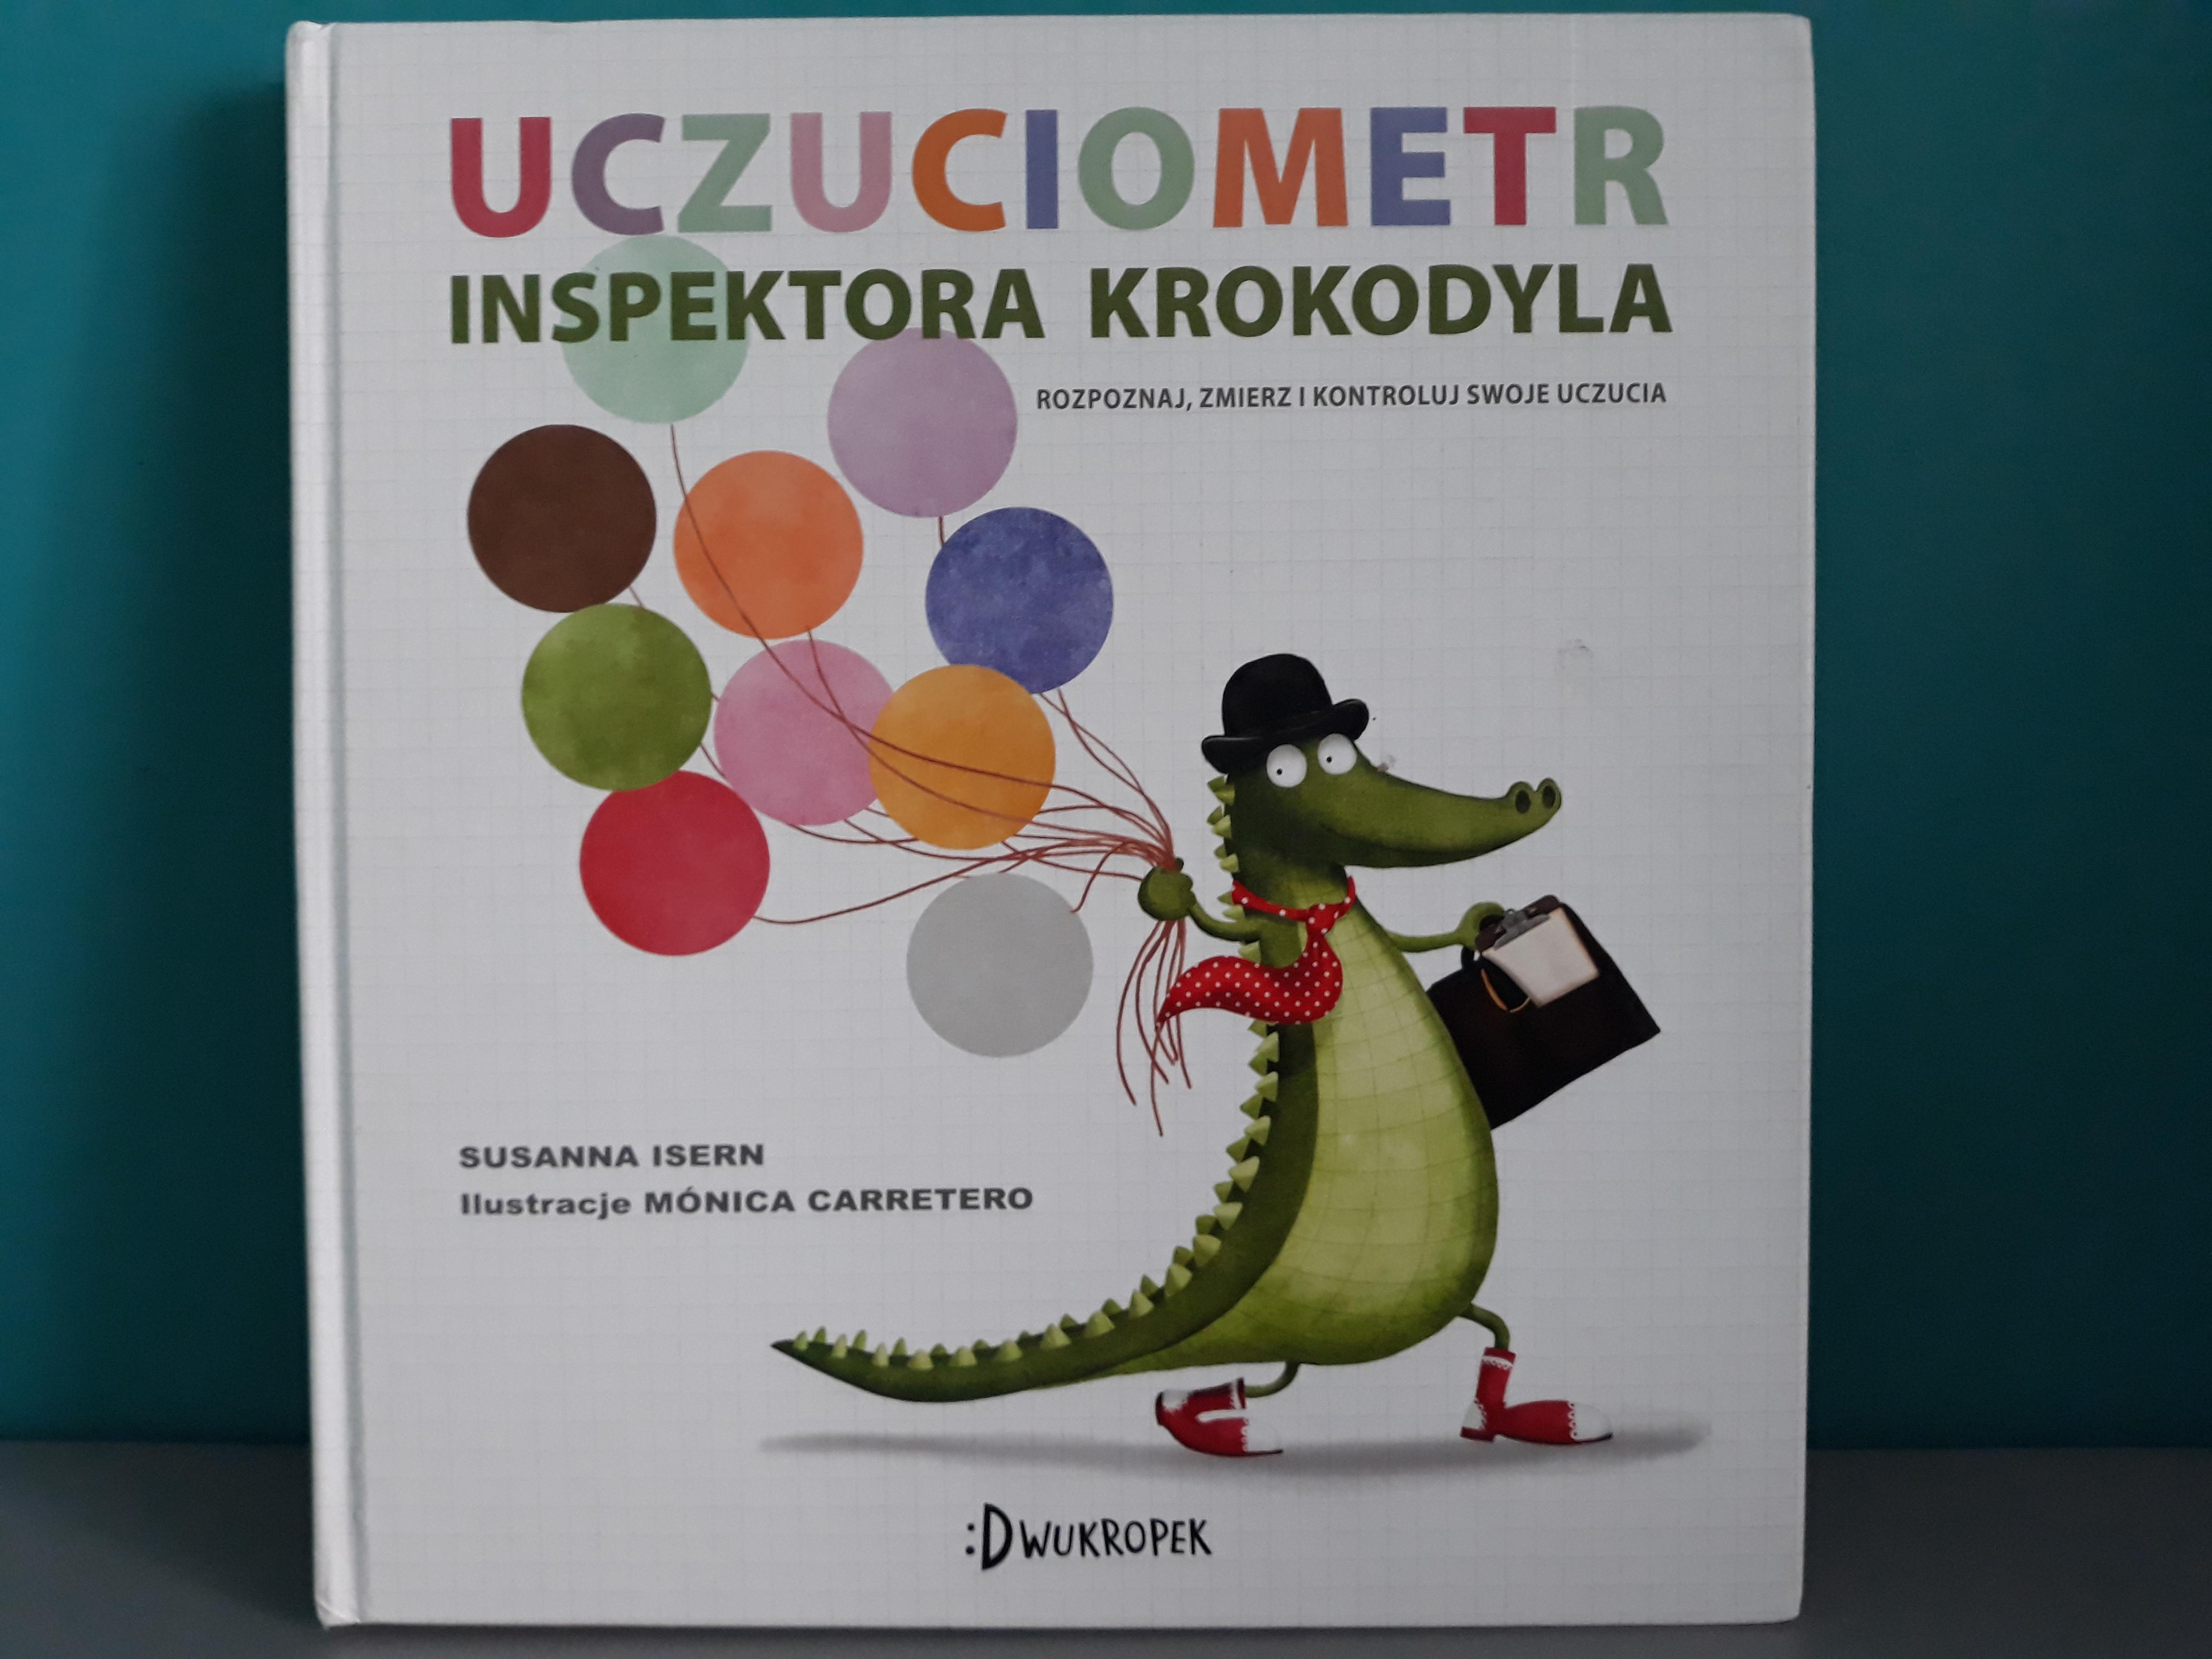 Uczuciometr Inspektora Krokodyla.